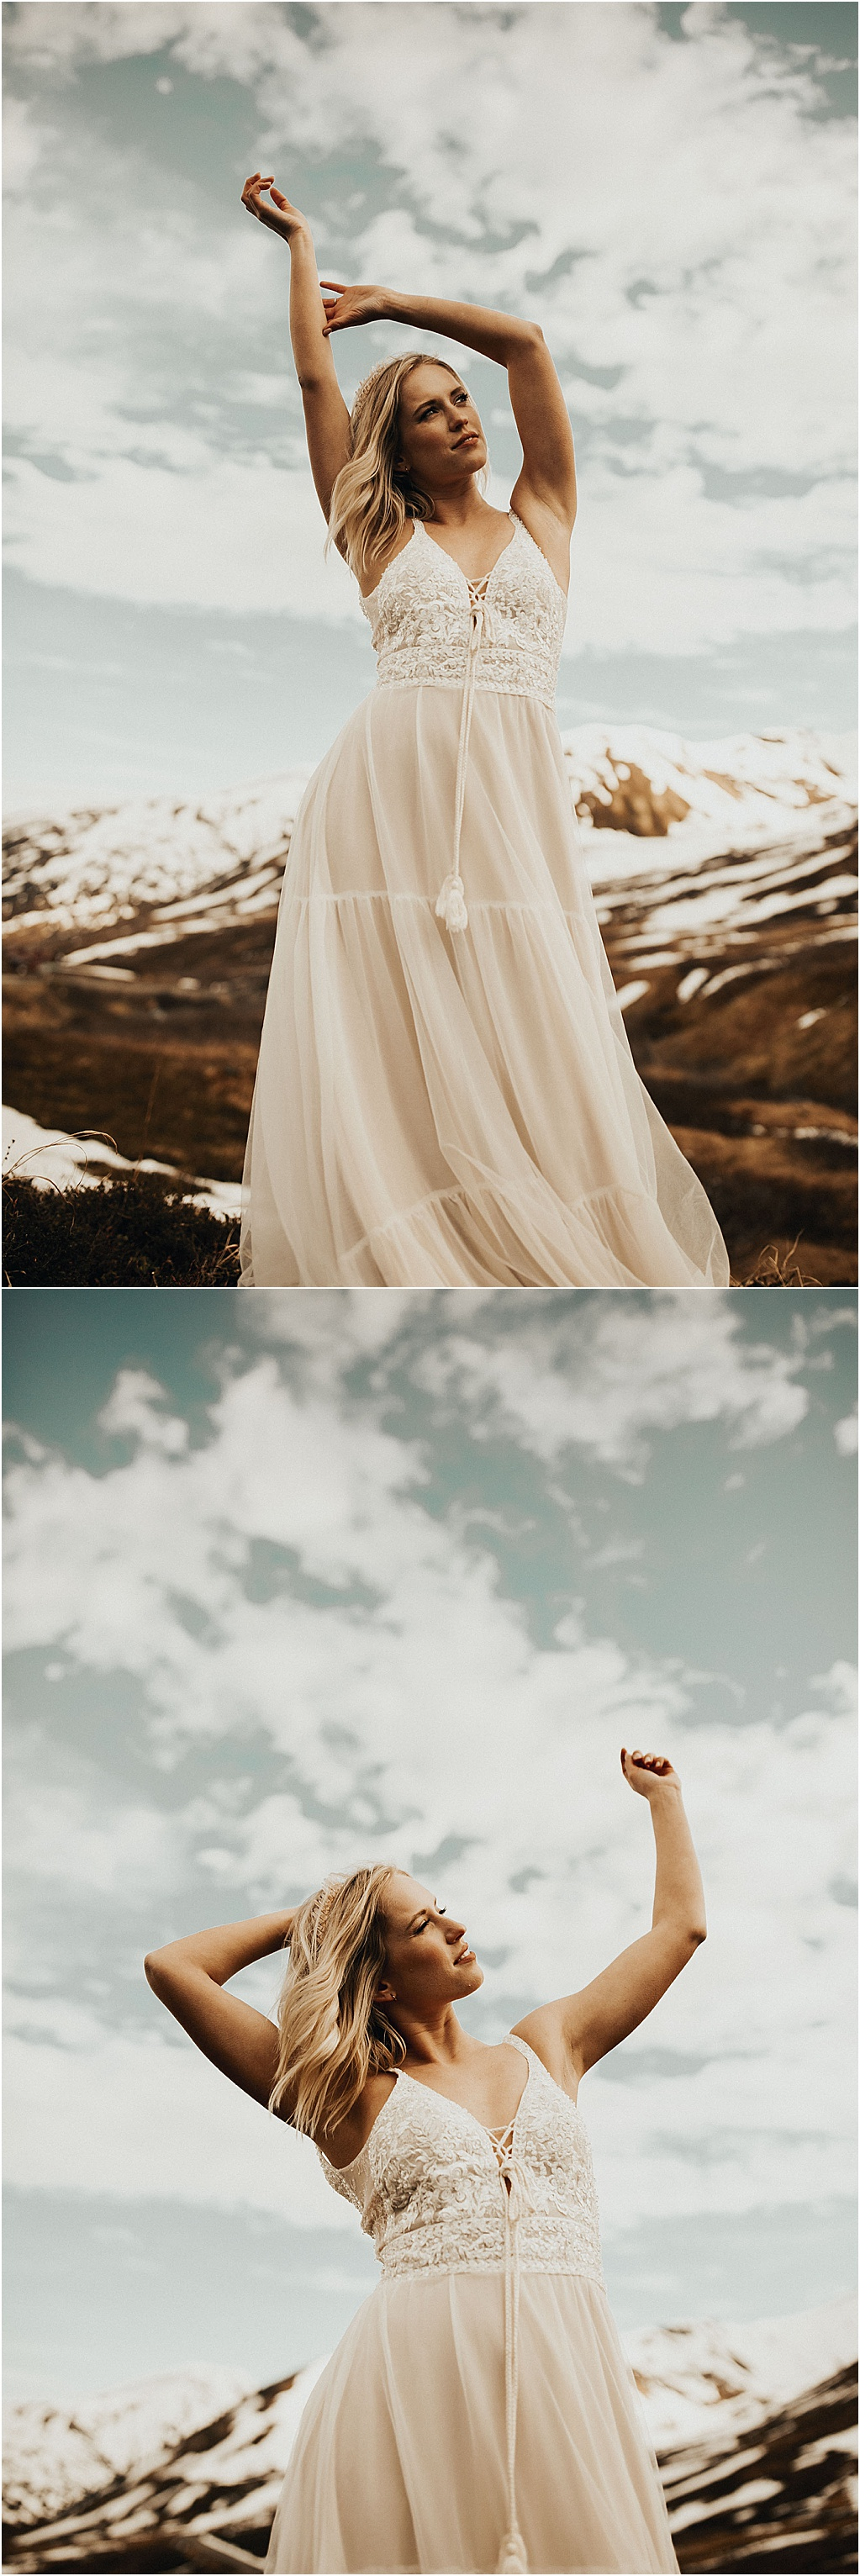 brittany_boote_pennsylvania_wedding_photographer_0421.jpg